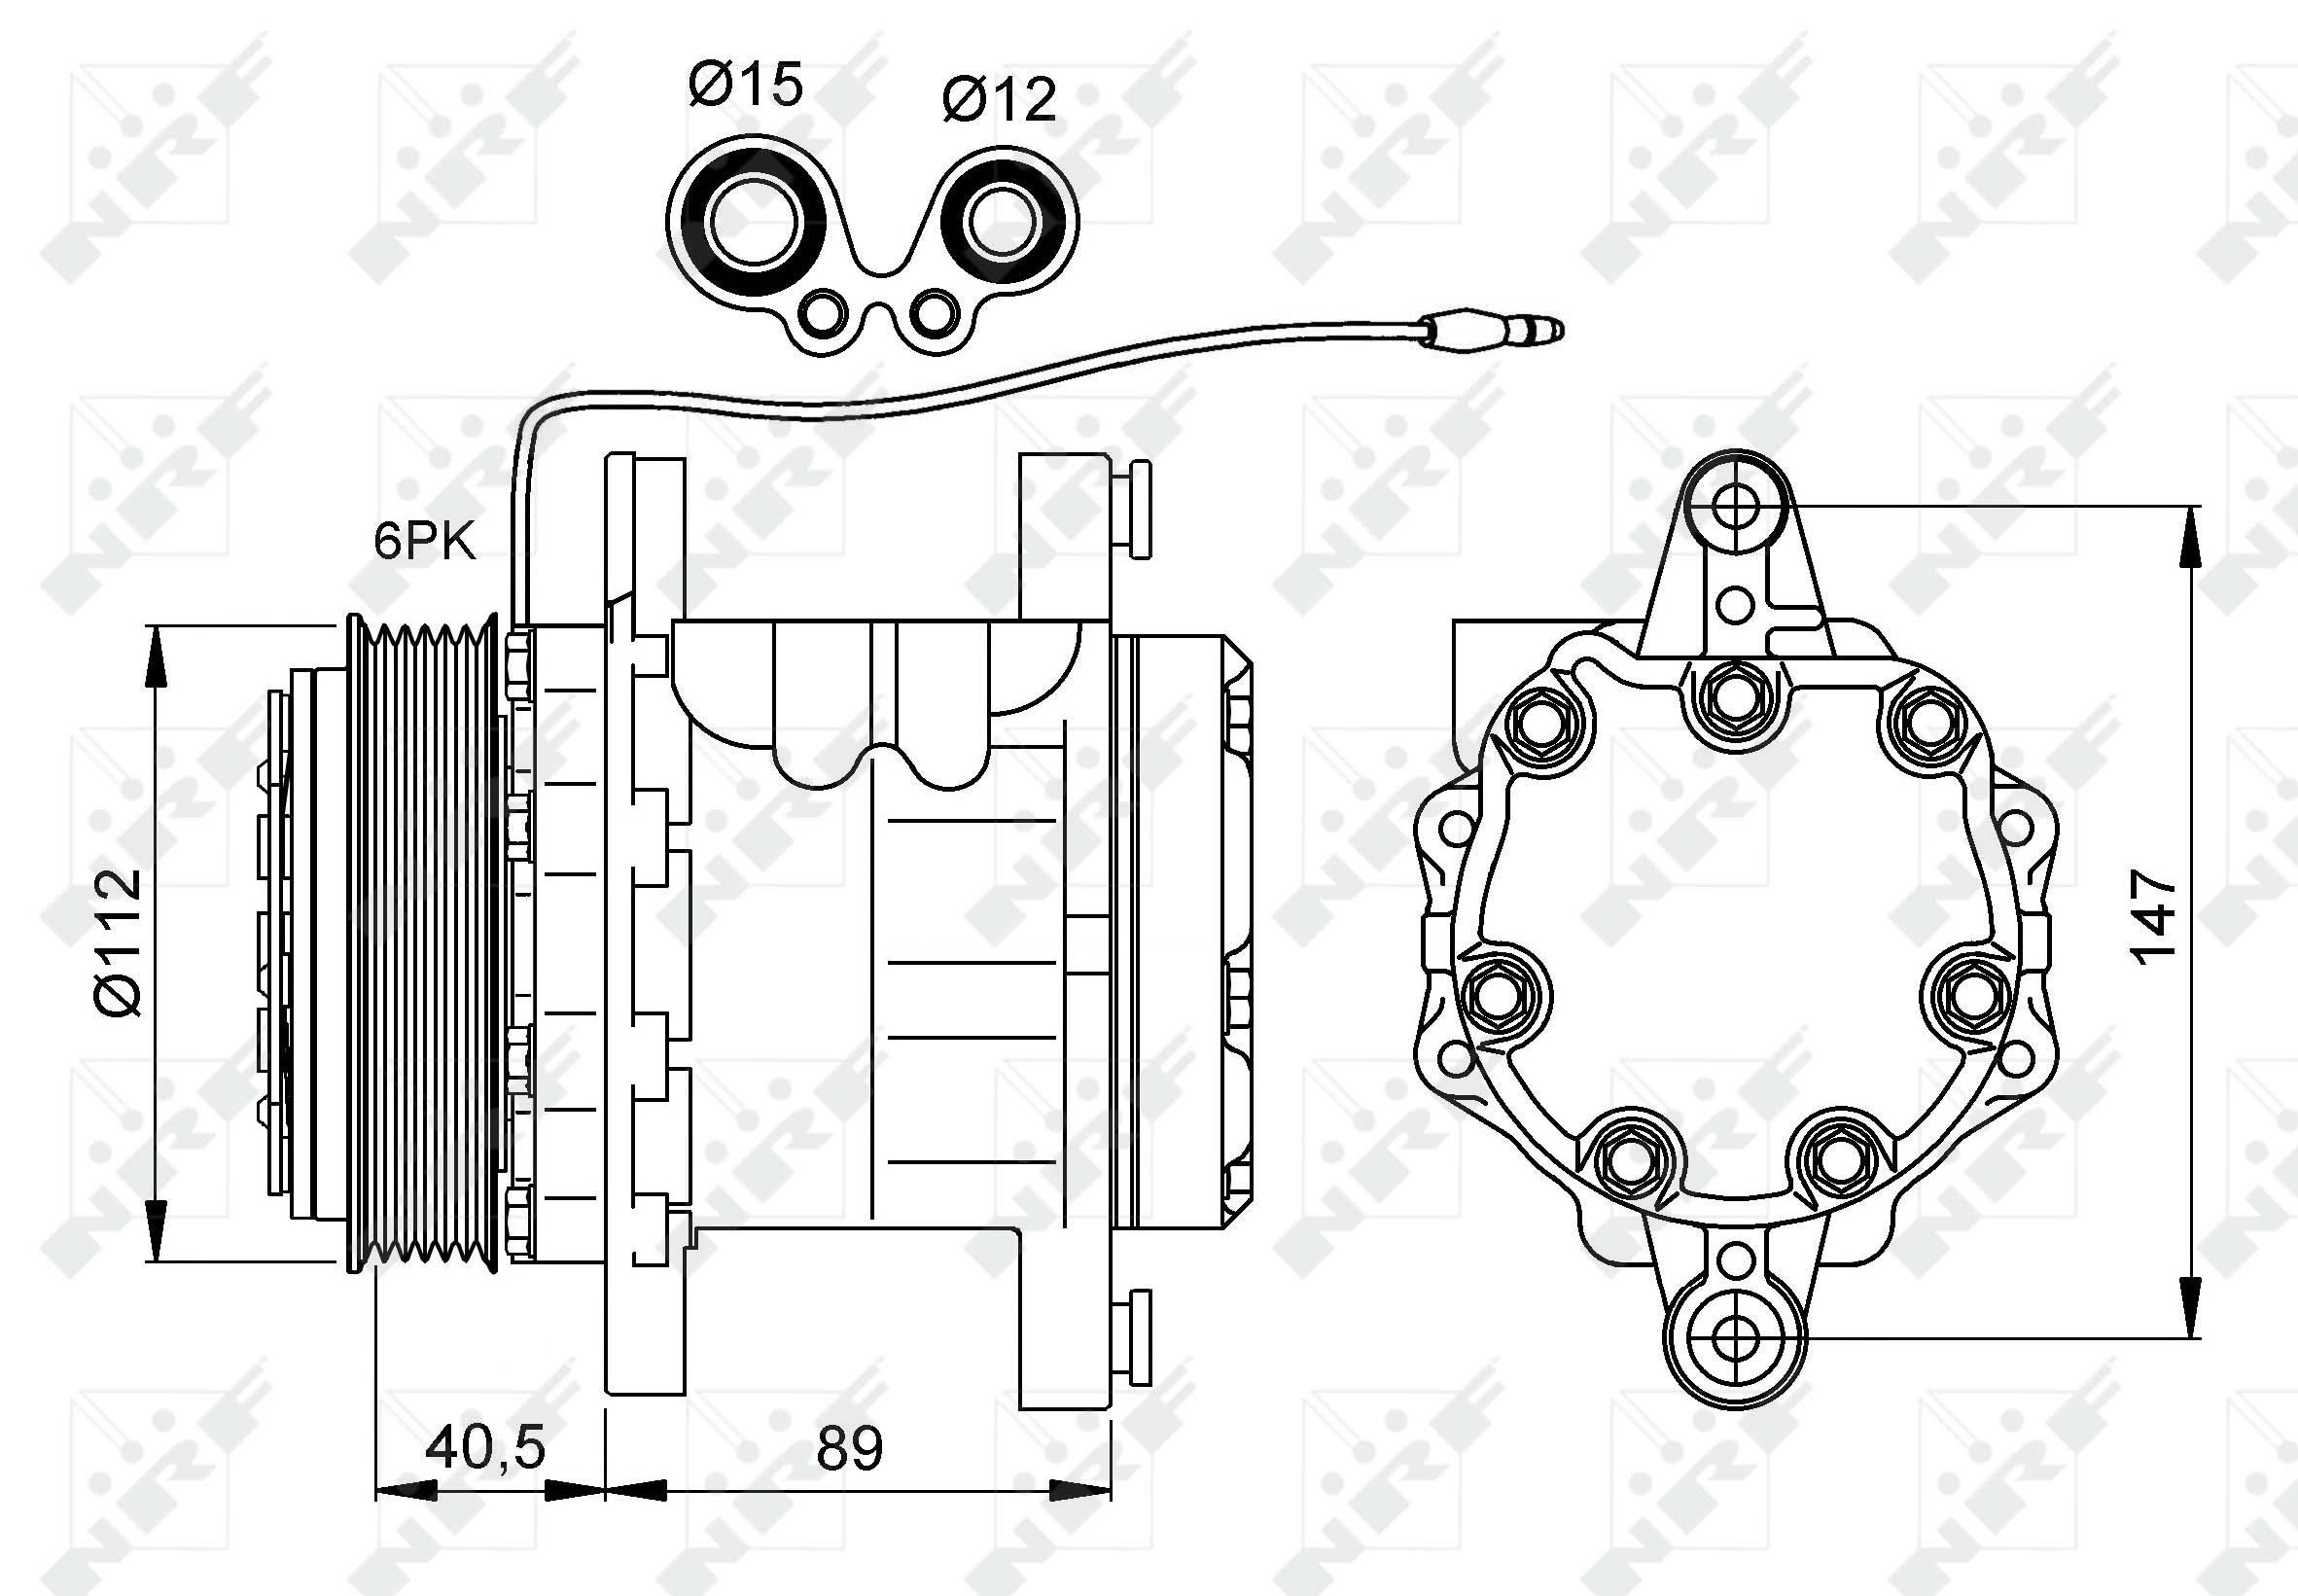 1999 Isuzu Rodeo Parts Diagram Free Download Wiring Diagrams